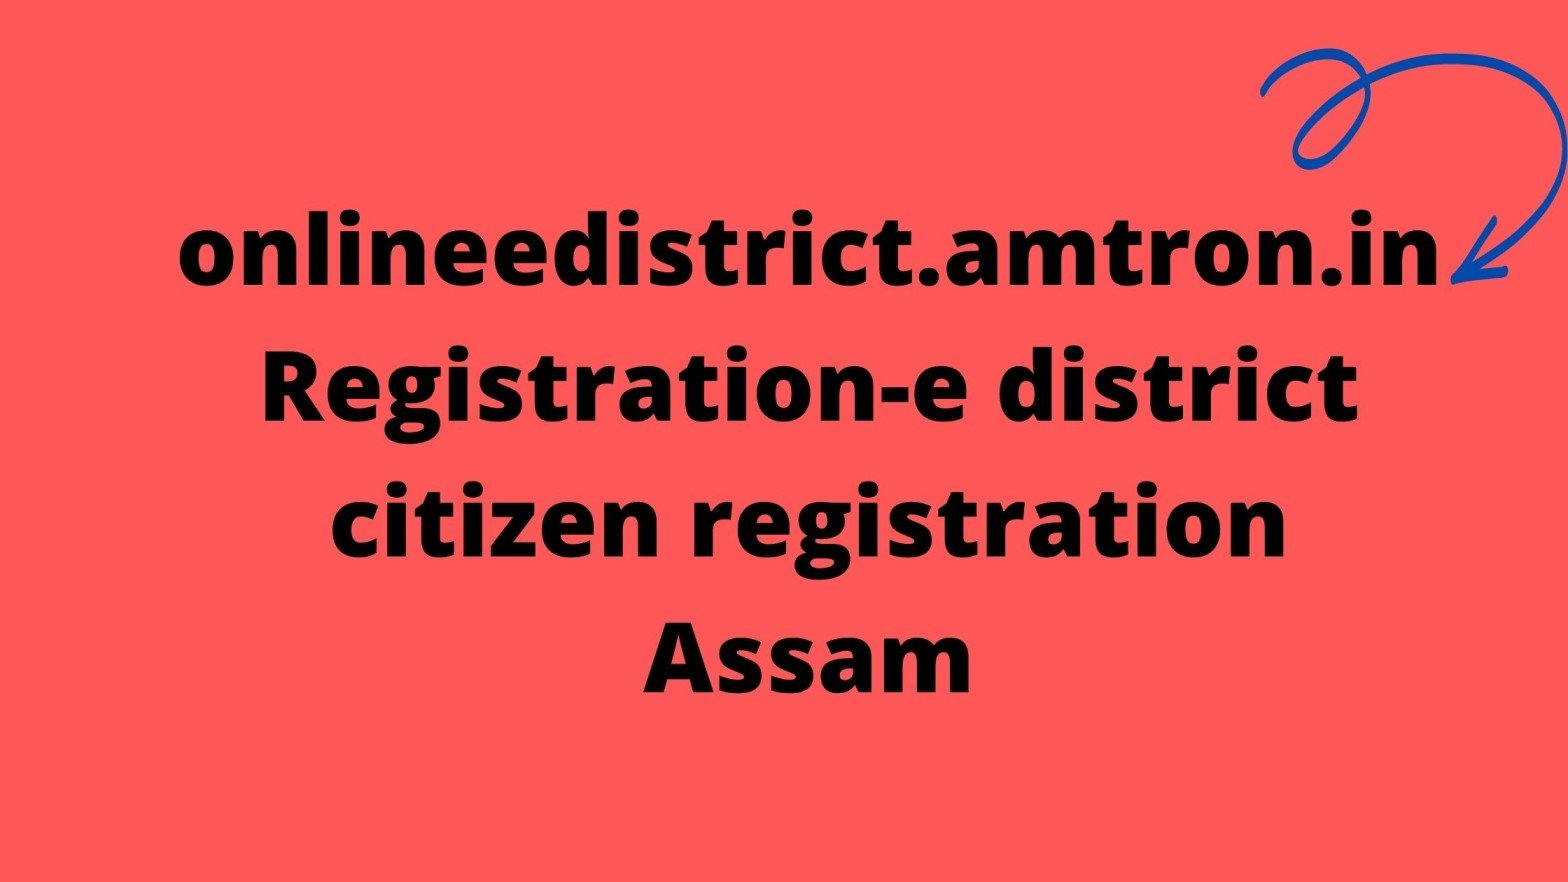 onlineedistrict.amtron.in Registration-e district citizen registration Assam